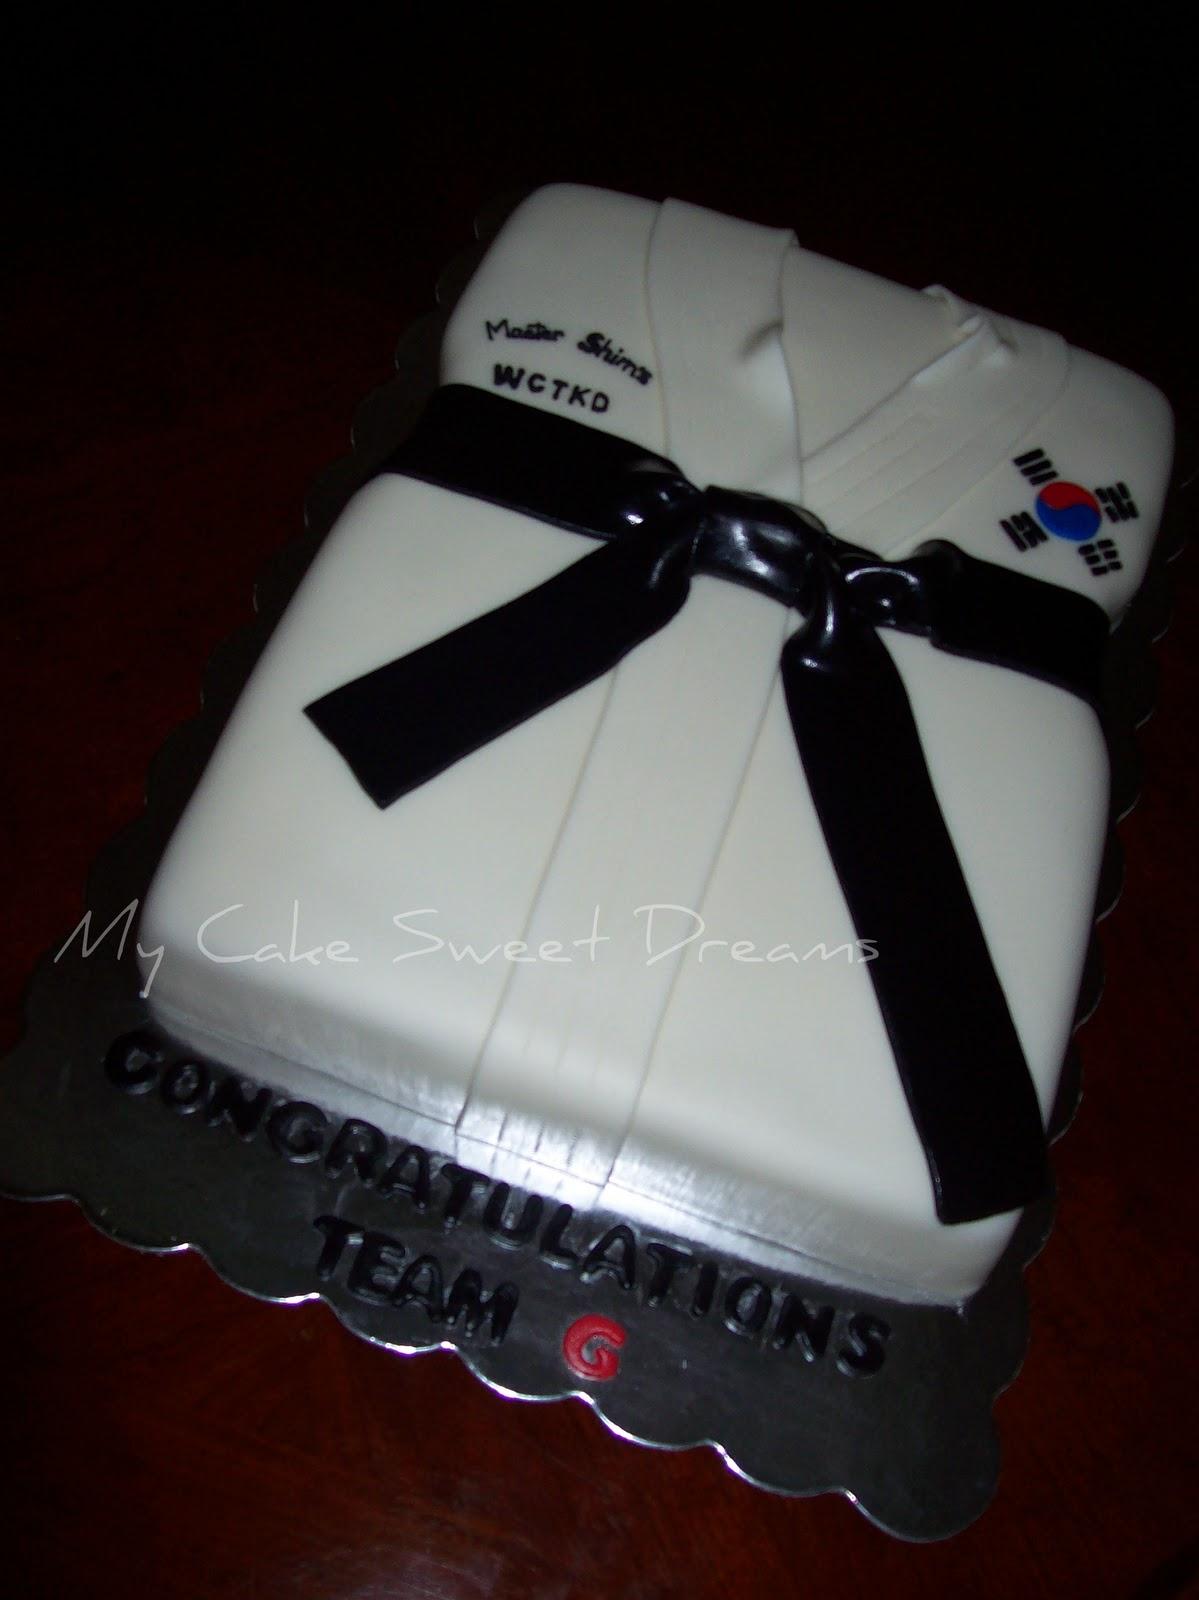 My Cake Sweet Dreams Tae Kwon Do Cake